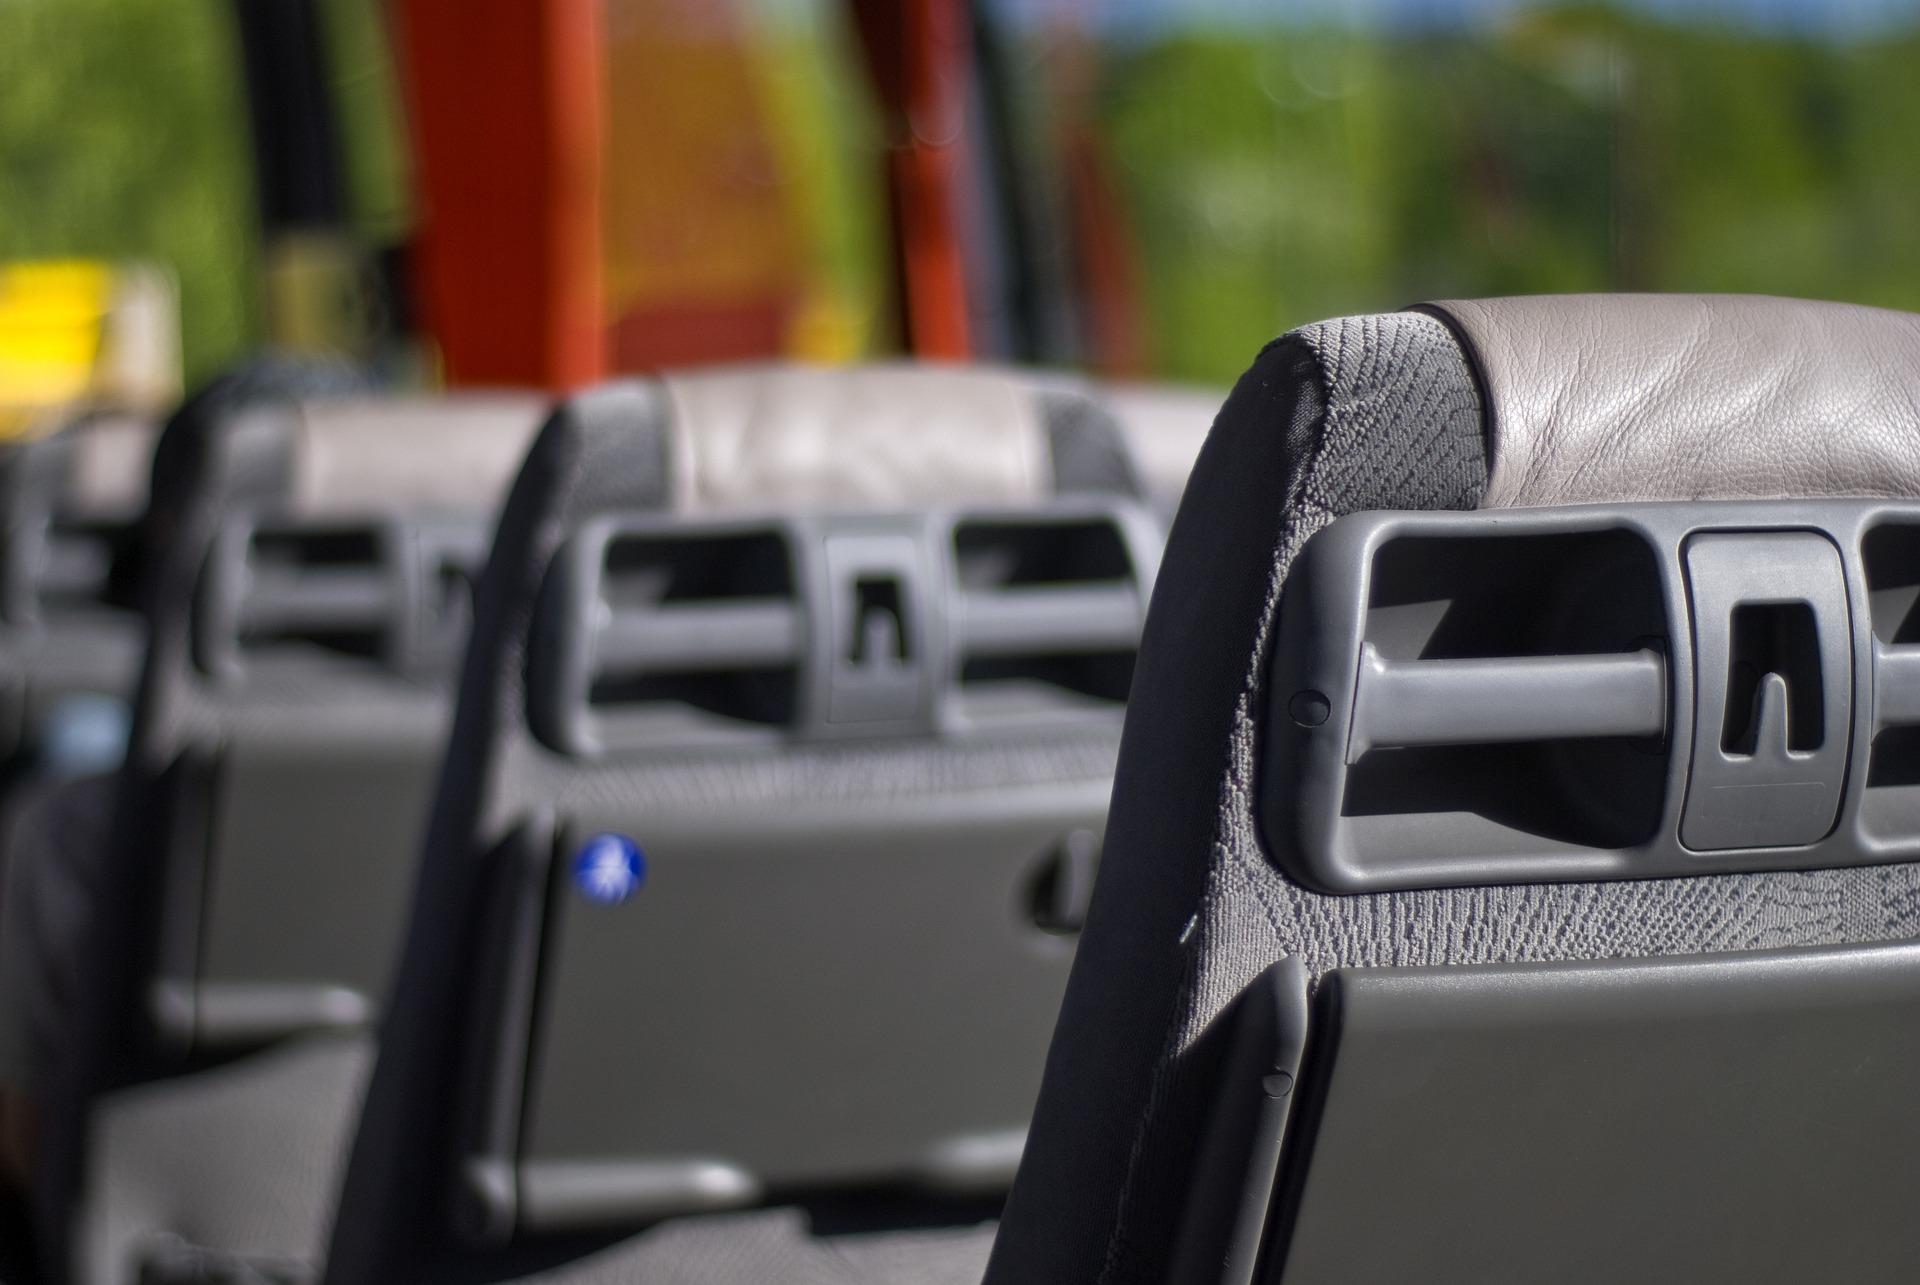 bus buschauffør trafik bustrafik